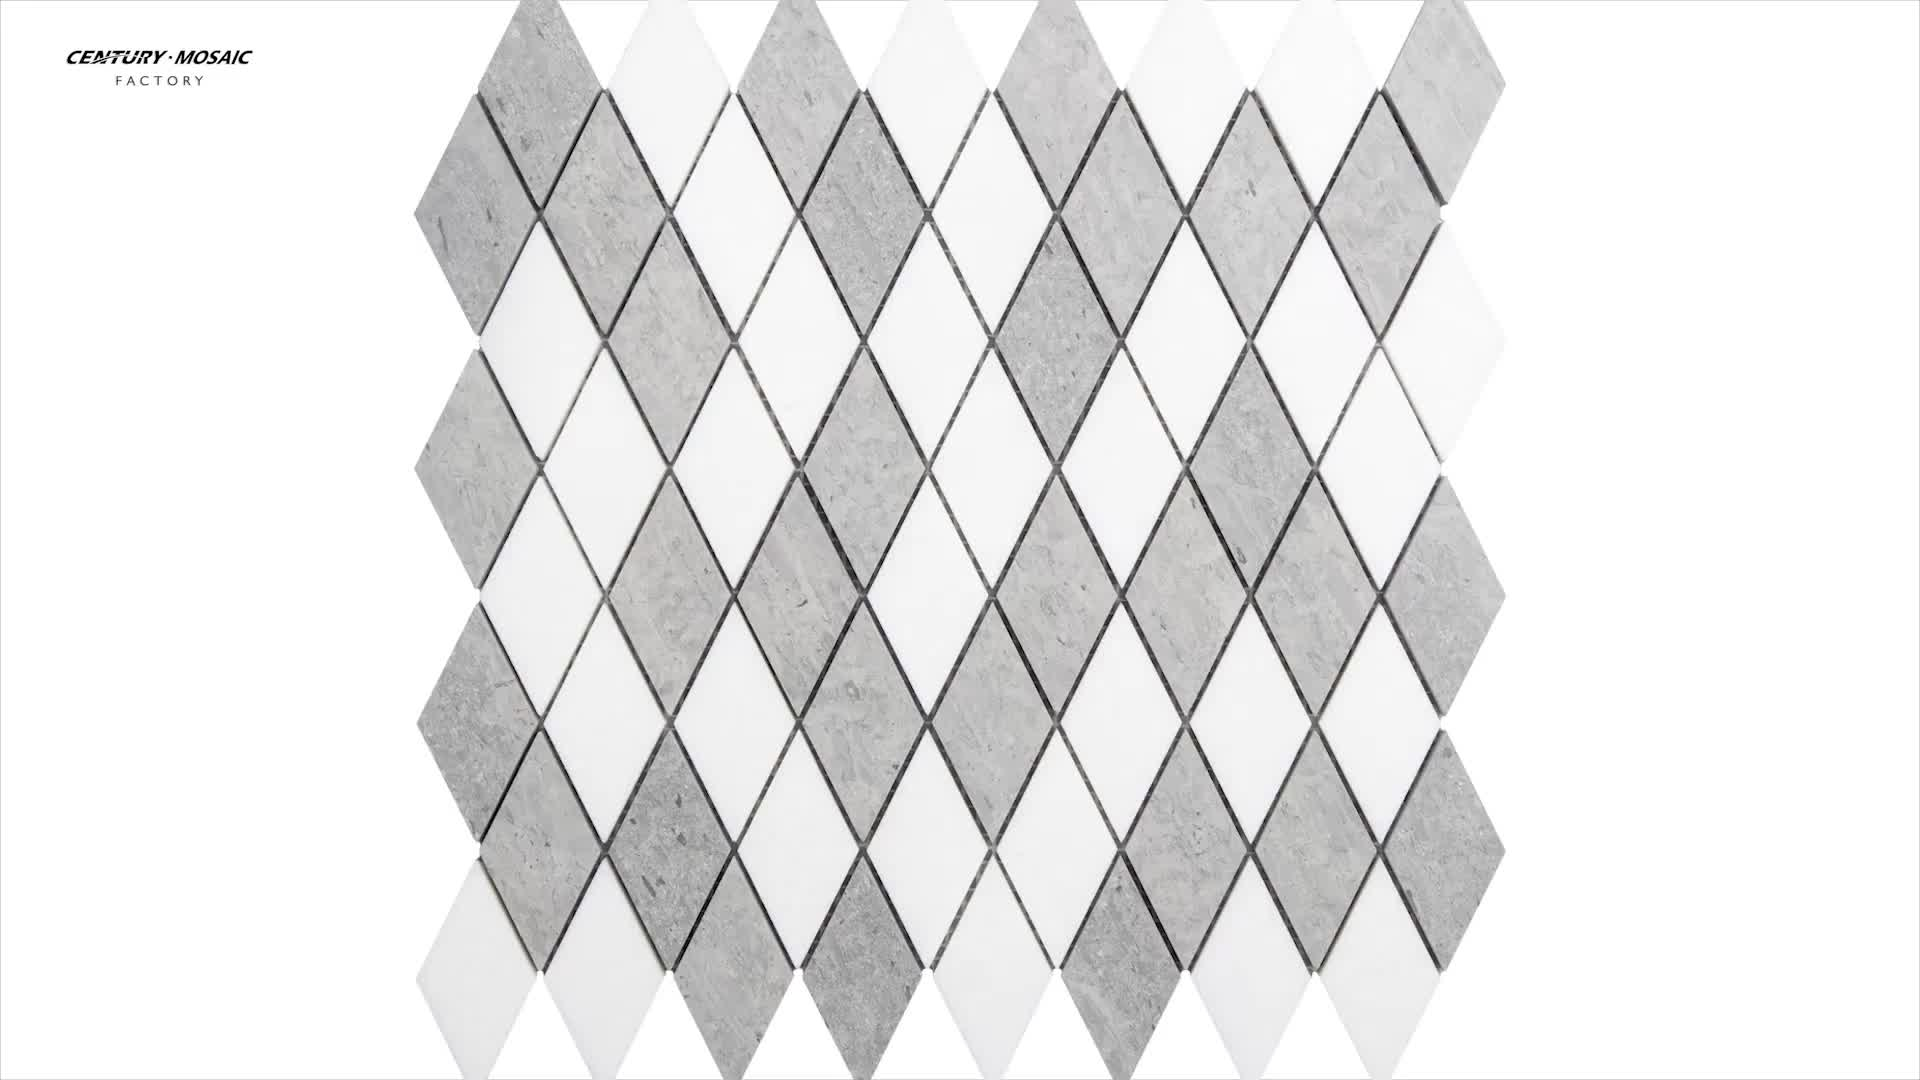 Italy bianco carrara white polished diamond pattern marble floor tiles